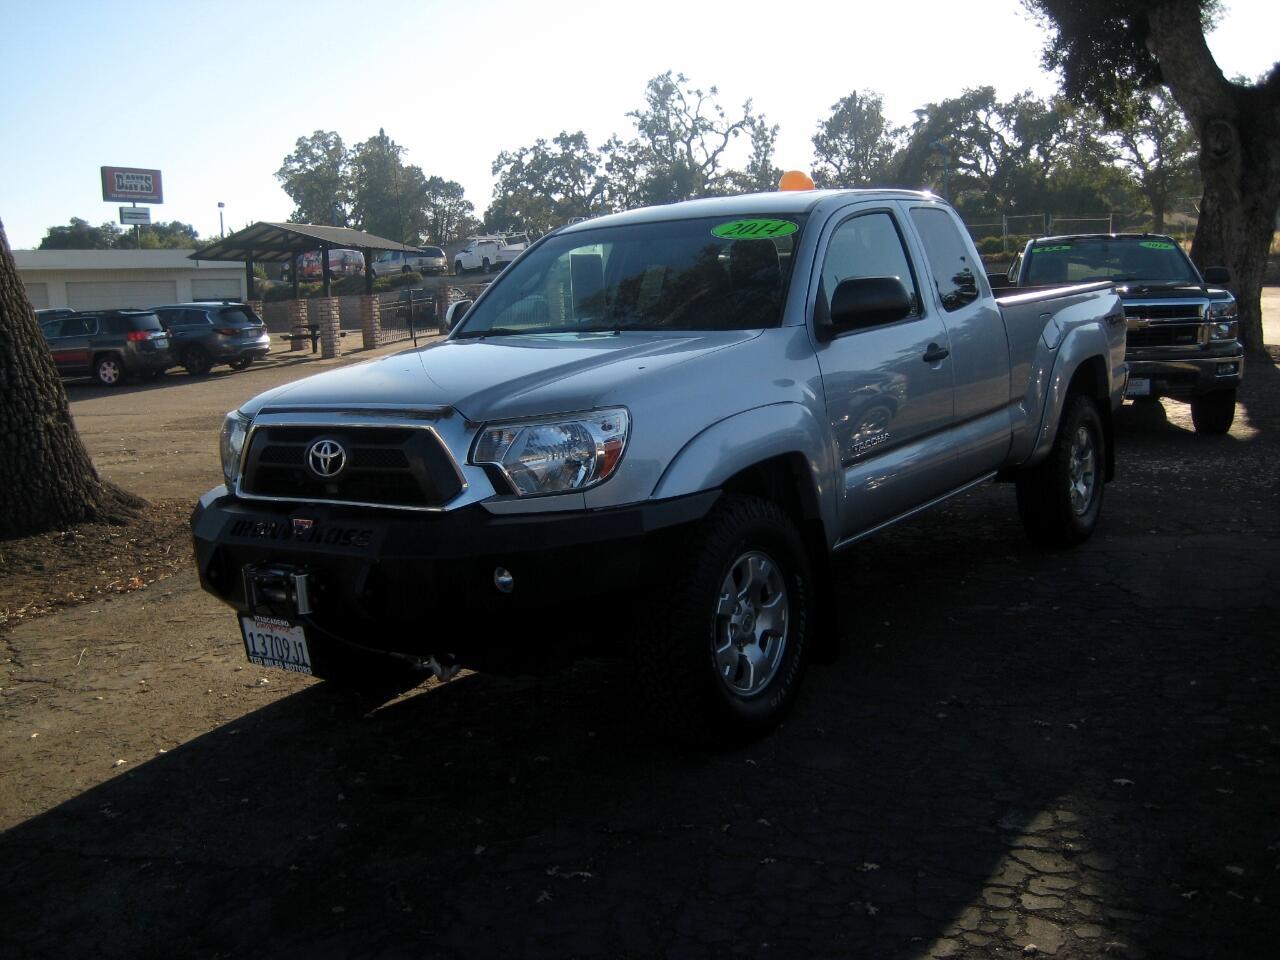 2013 Toyota Tacoma 4WD Access Cab V6 AT (Natl)